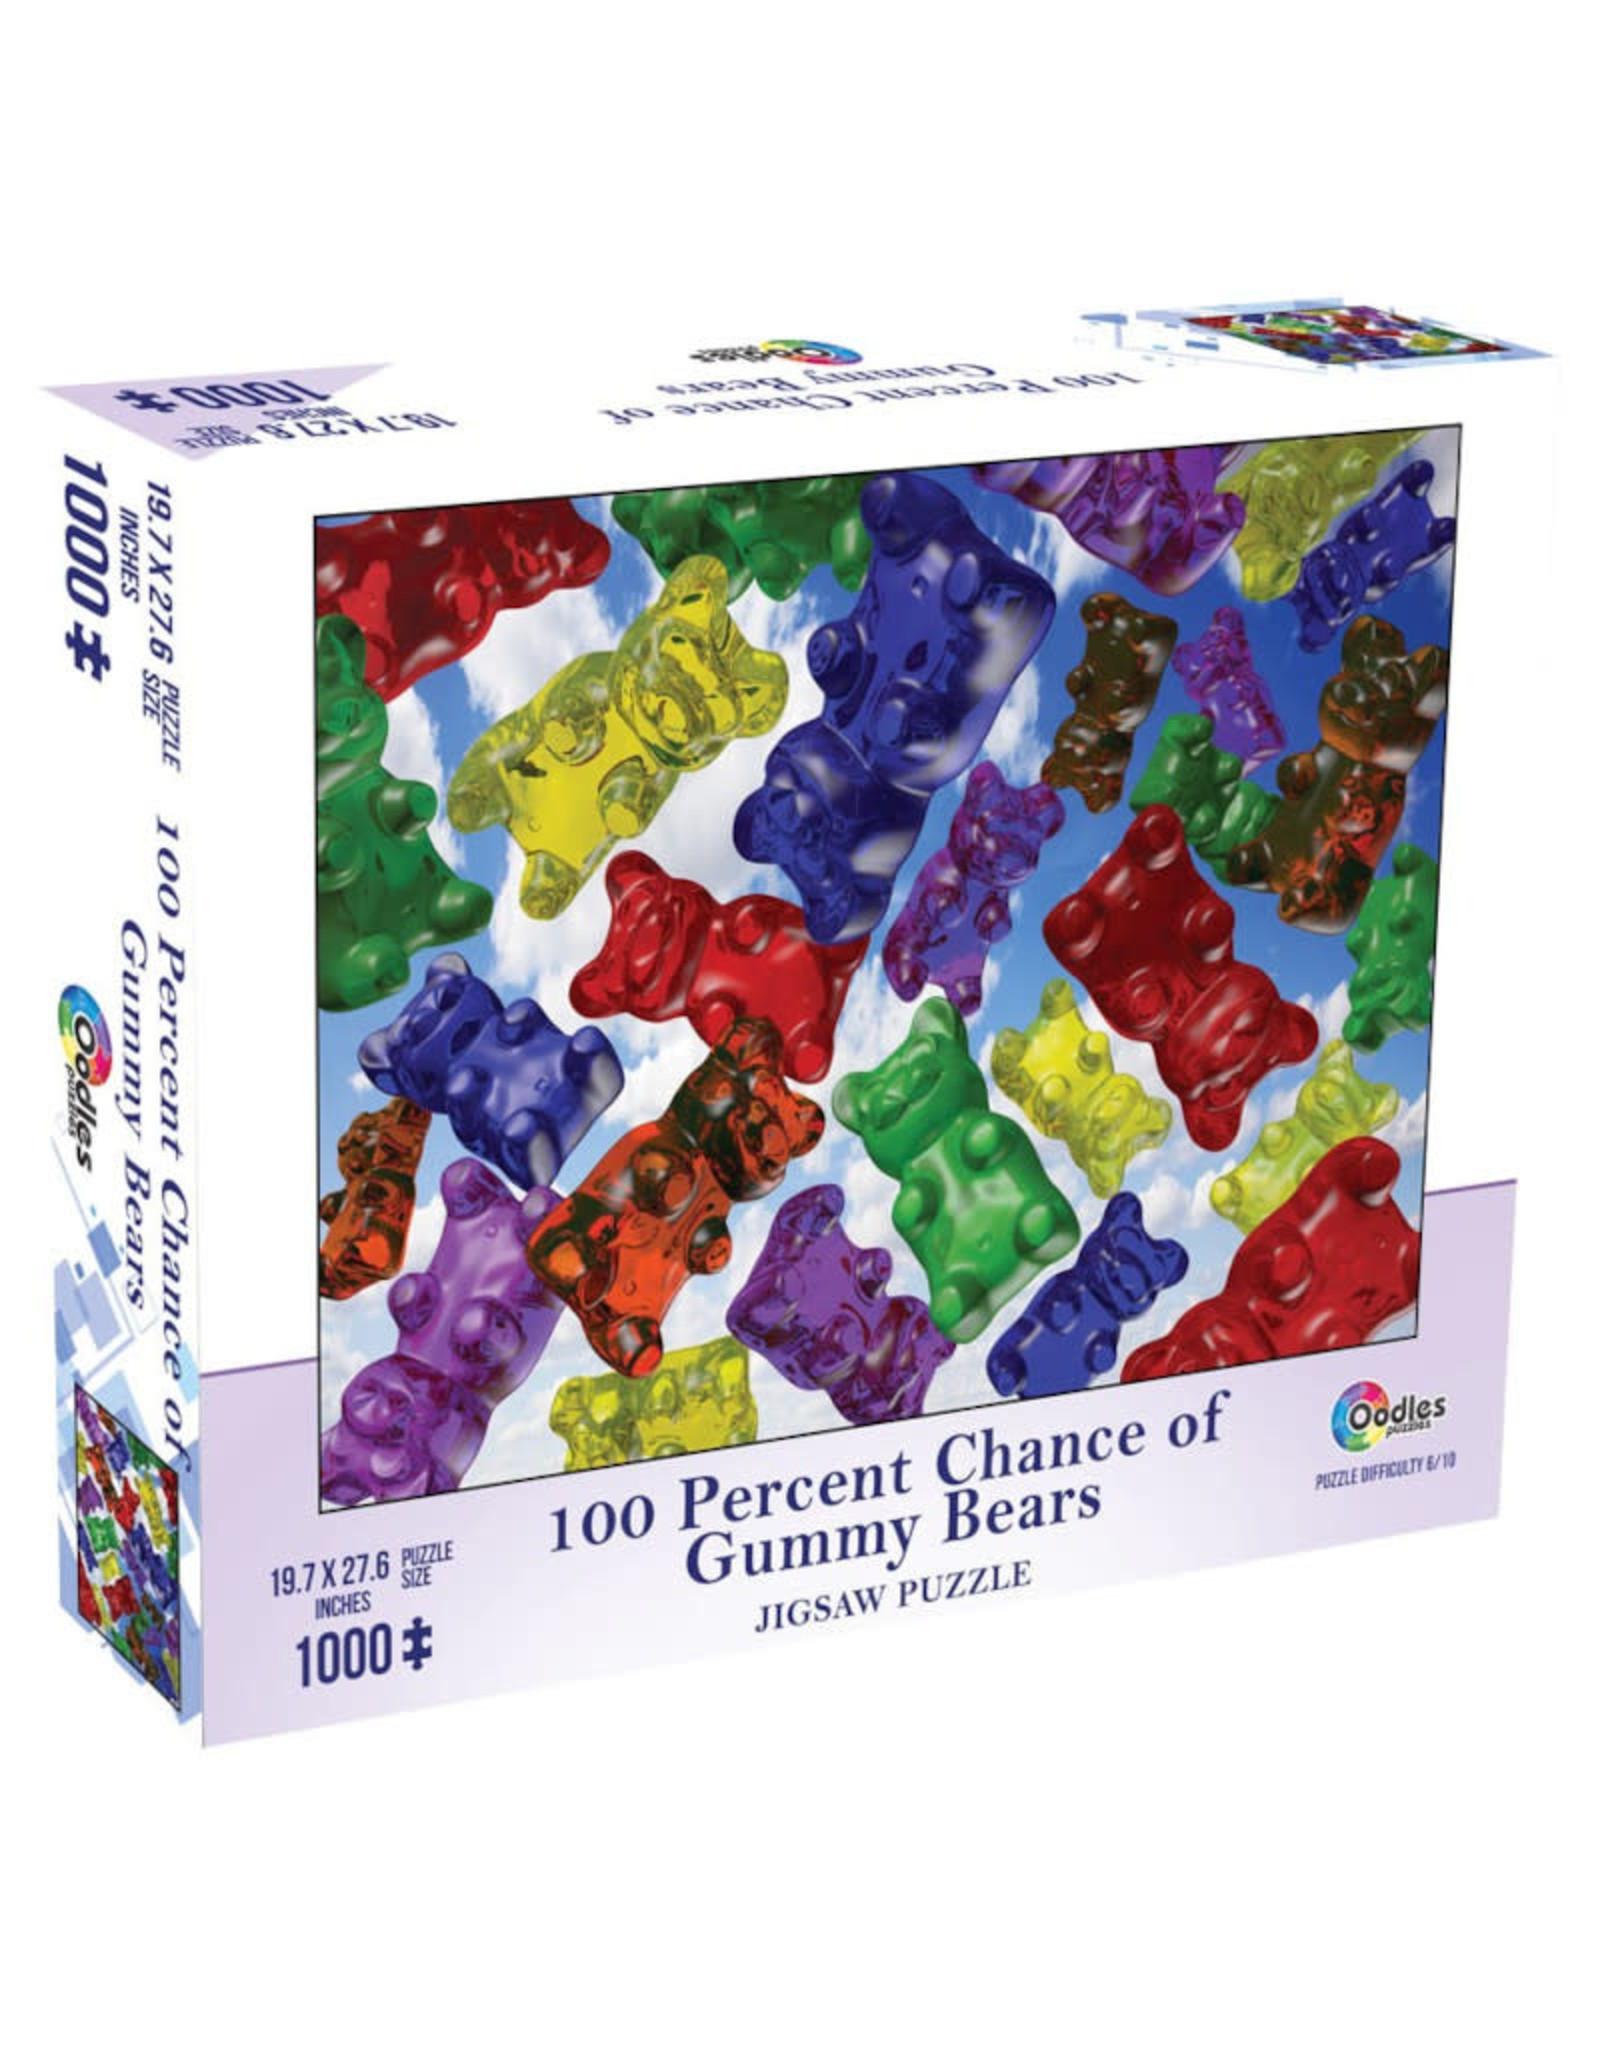 Miscellaneous 100% Chance of Gummy Bears Puzzle 1000 PCS